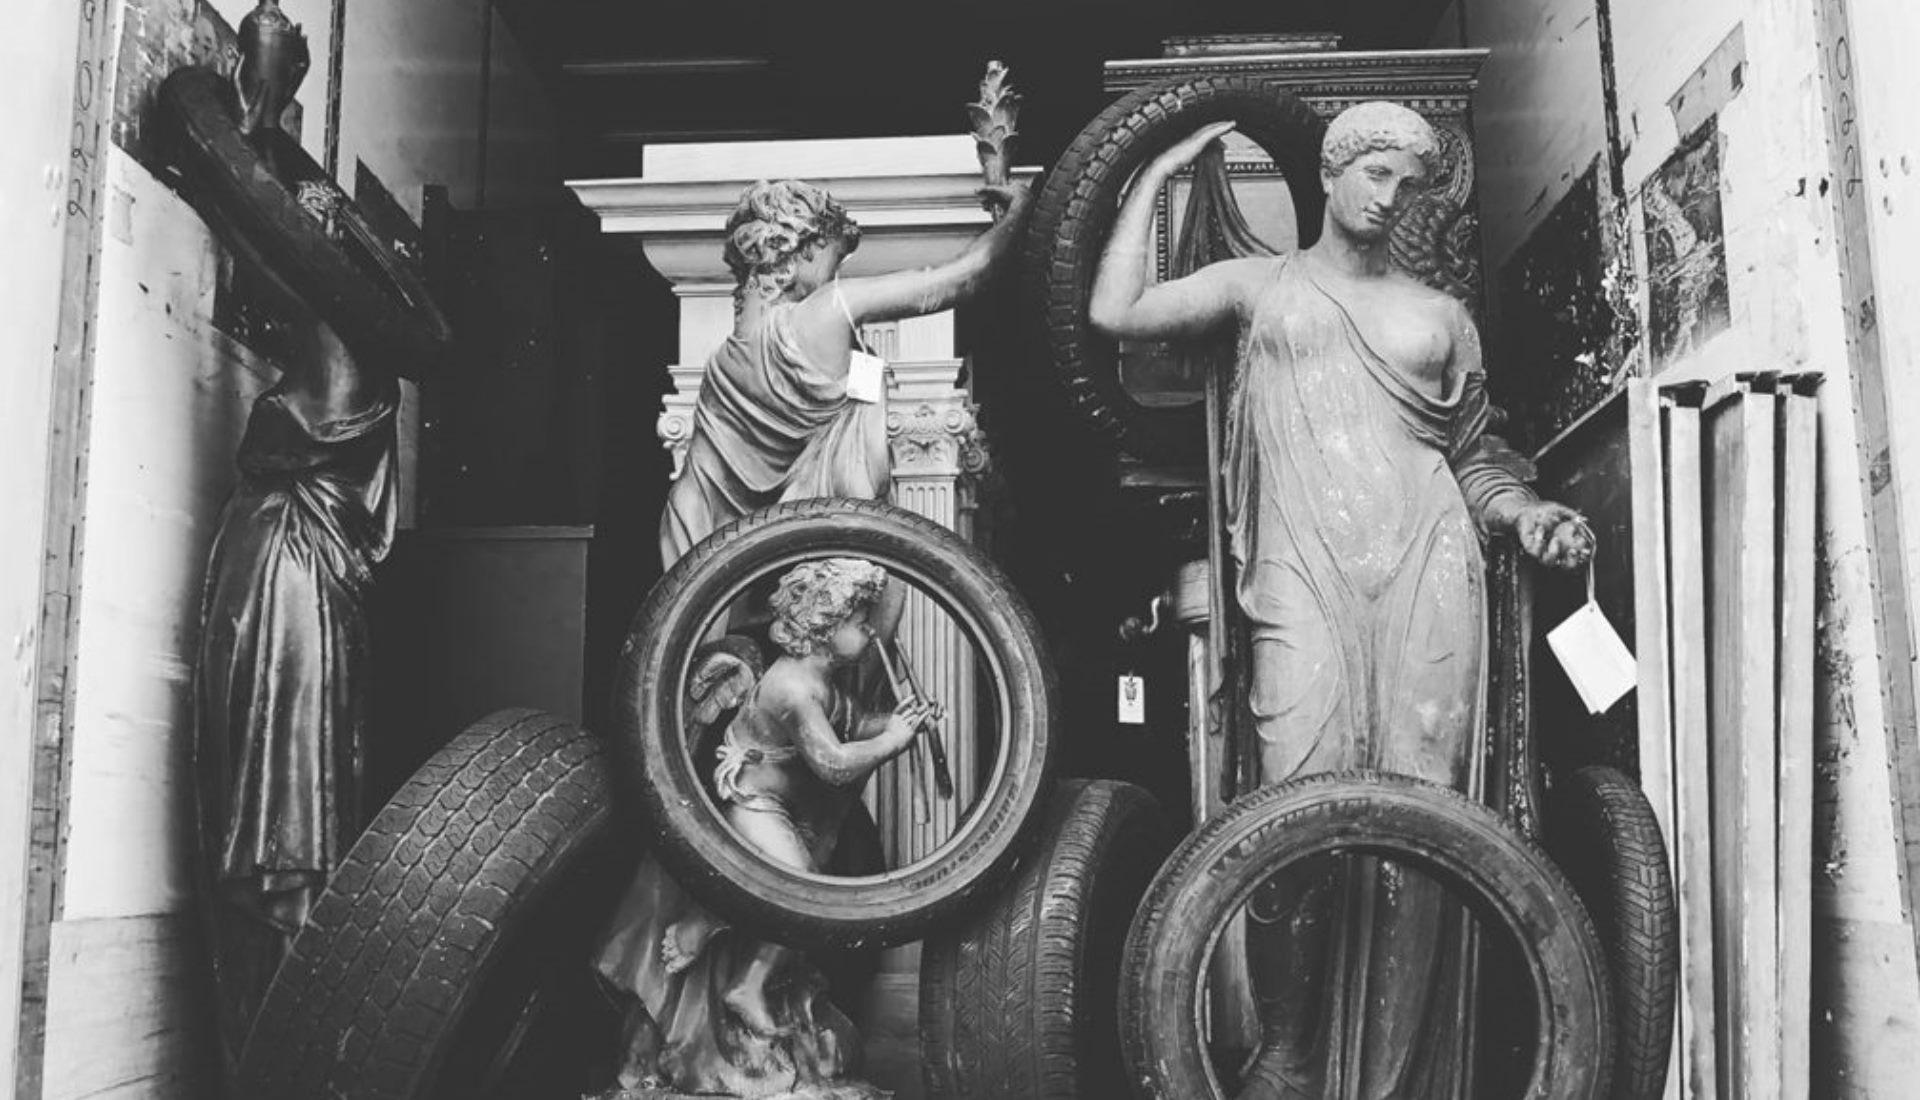 About Metropolitan Artifacts